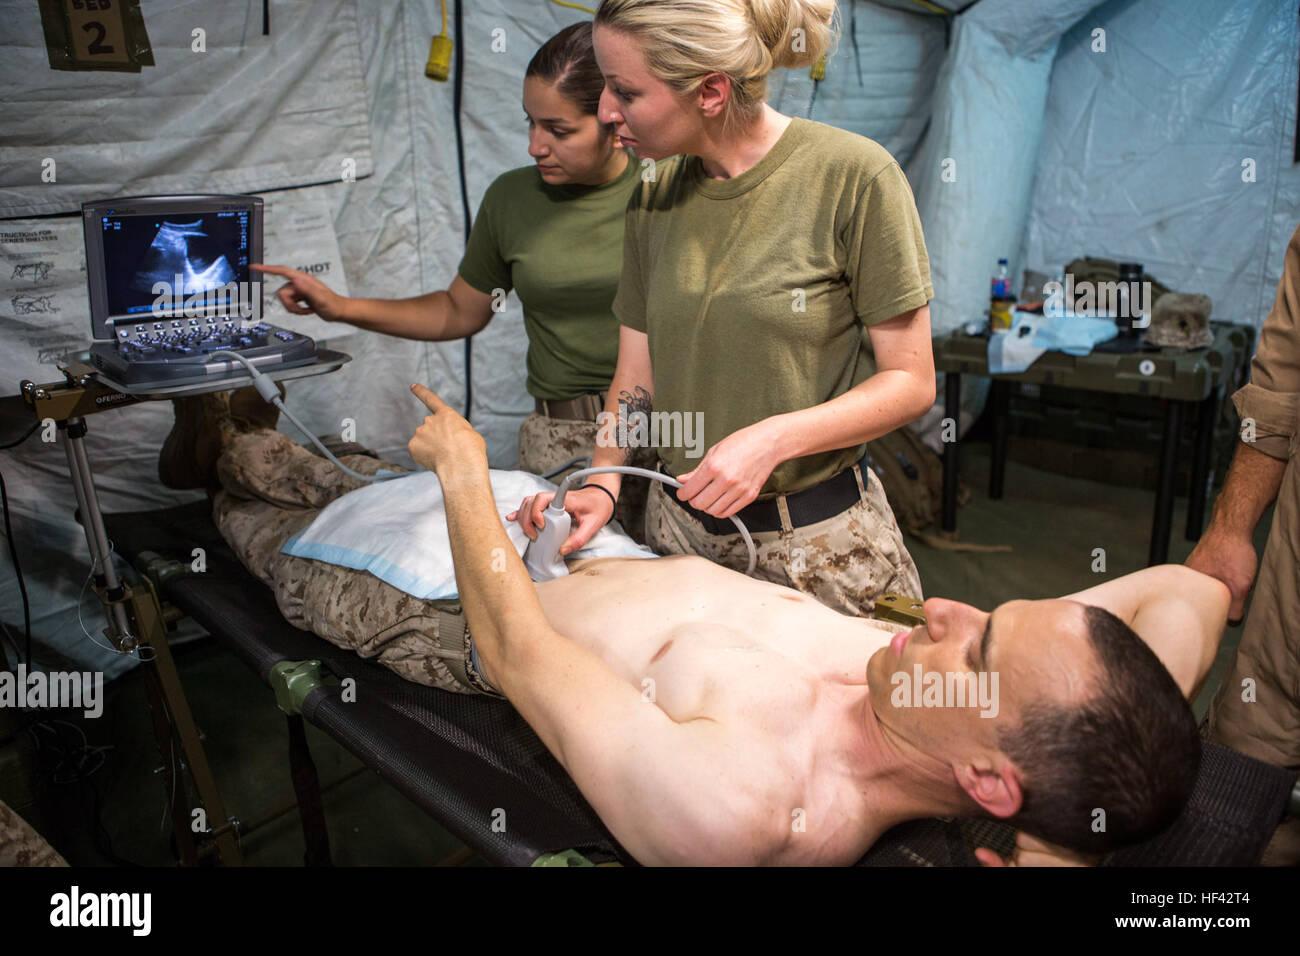 U.S. Navy Hospital Corpsman 2nd Class Ashley Tockweiler practices proper positioning procedures on U.S. Navy Lt. Stock Photo